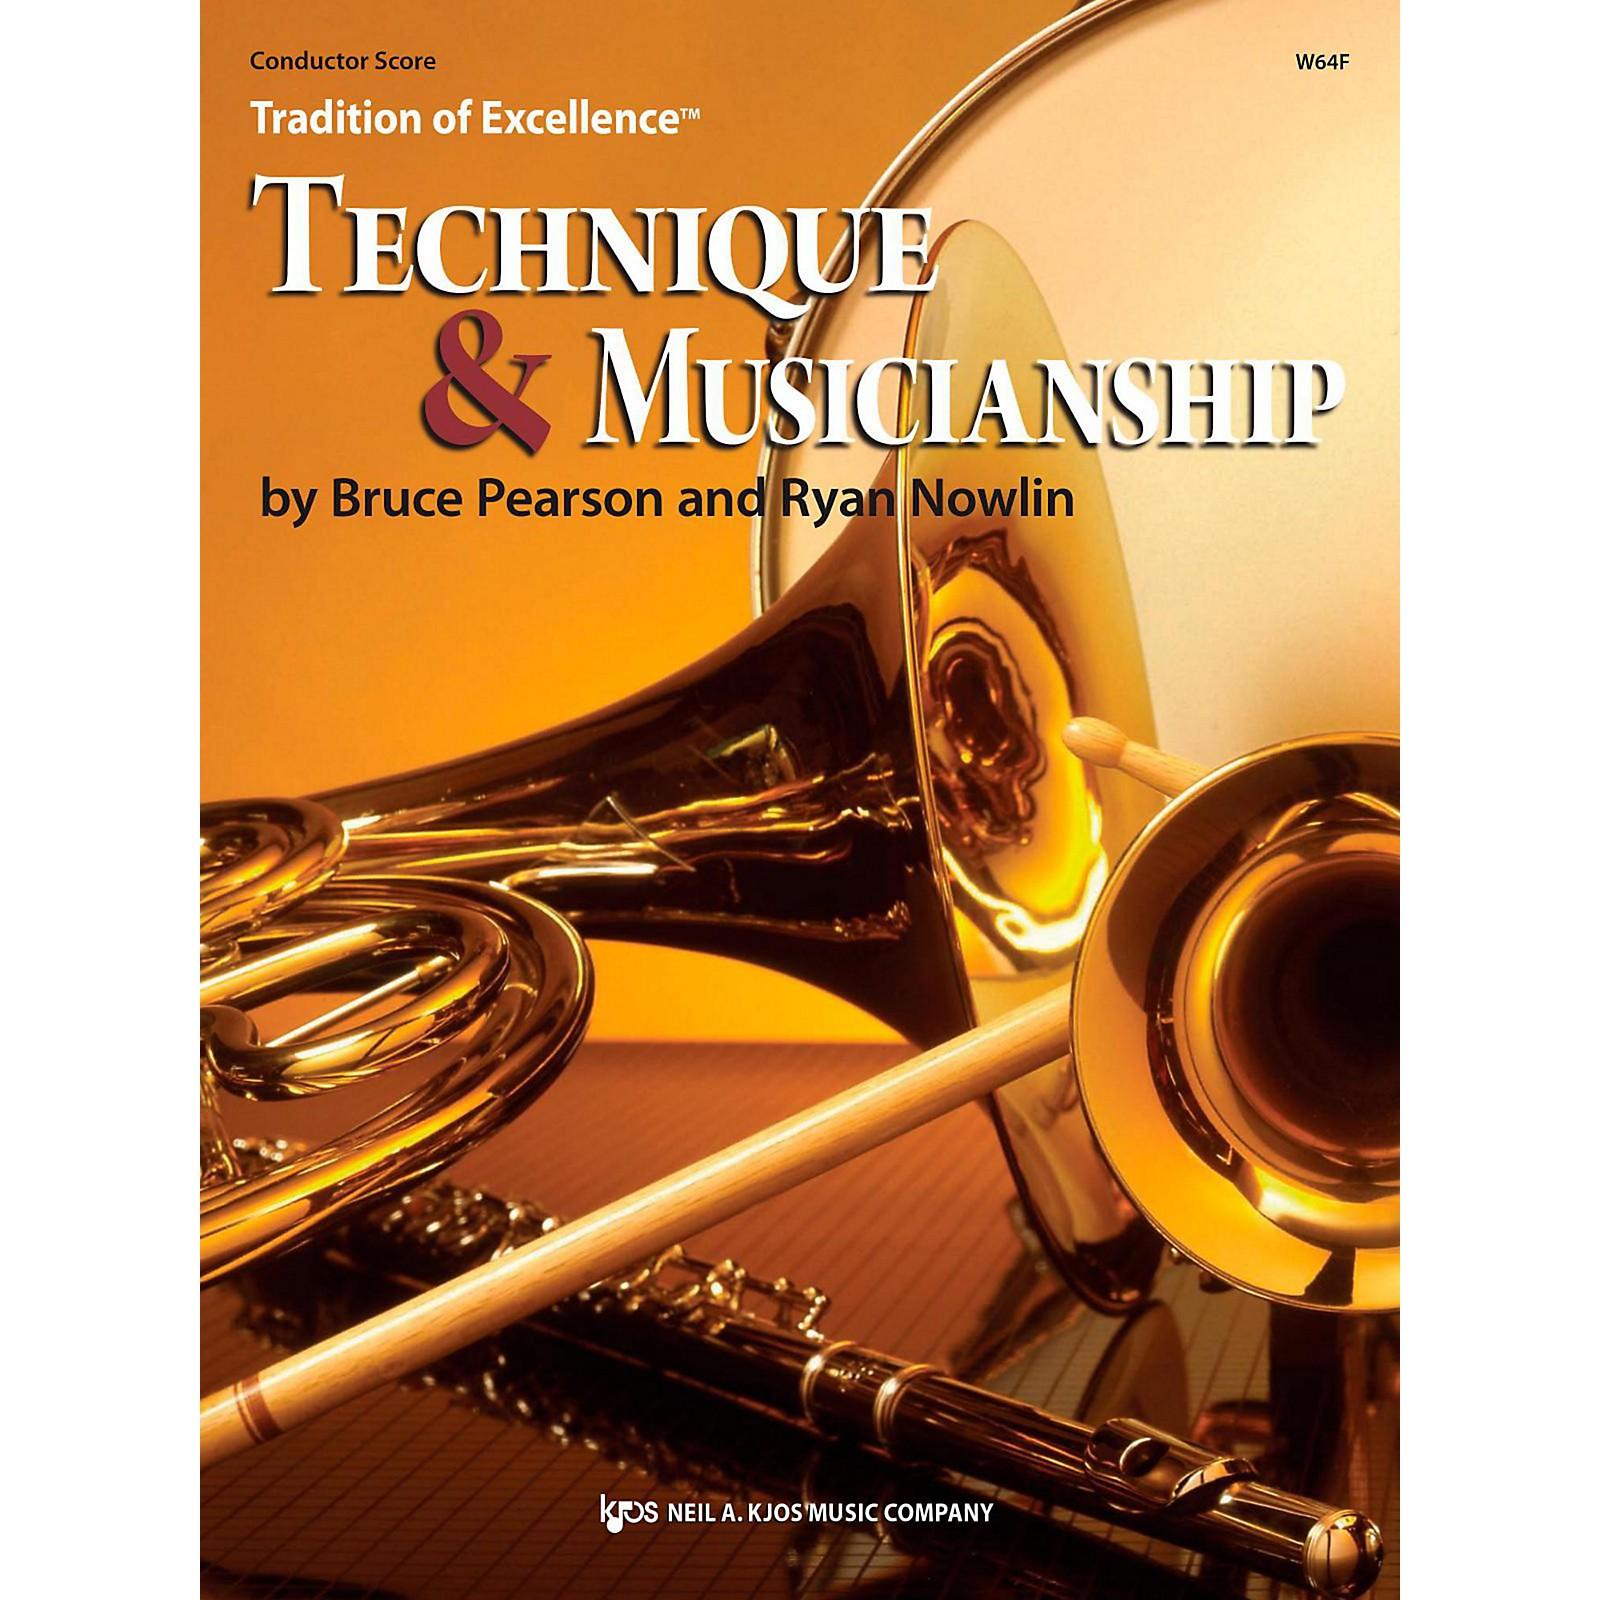 KJOS Tradition of Excellence: Technique & Musicianship Conductor Score